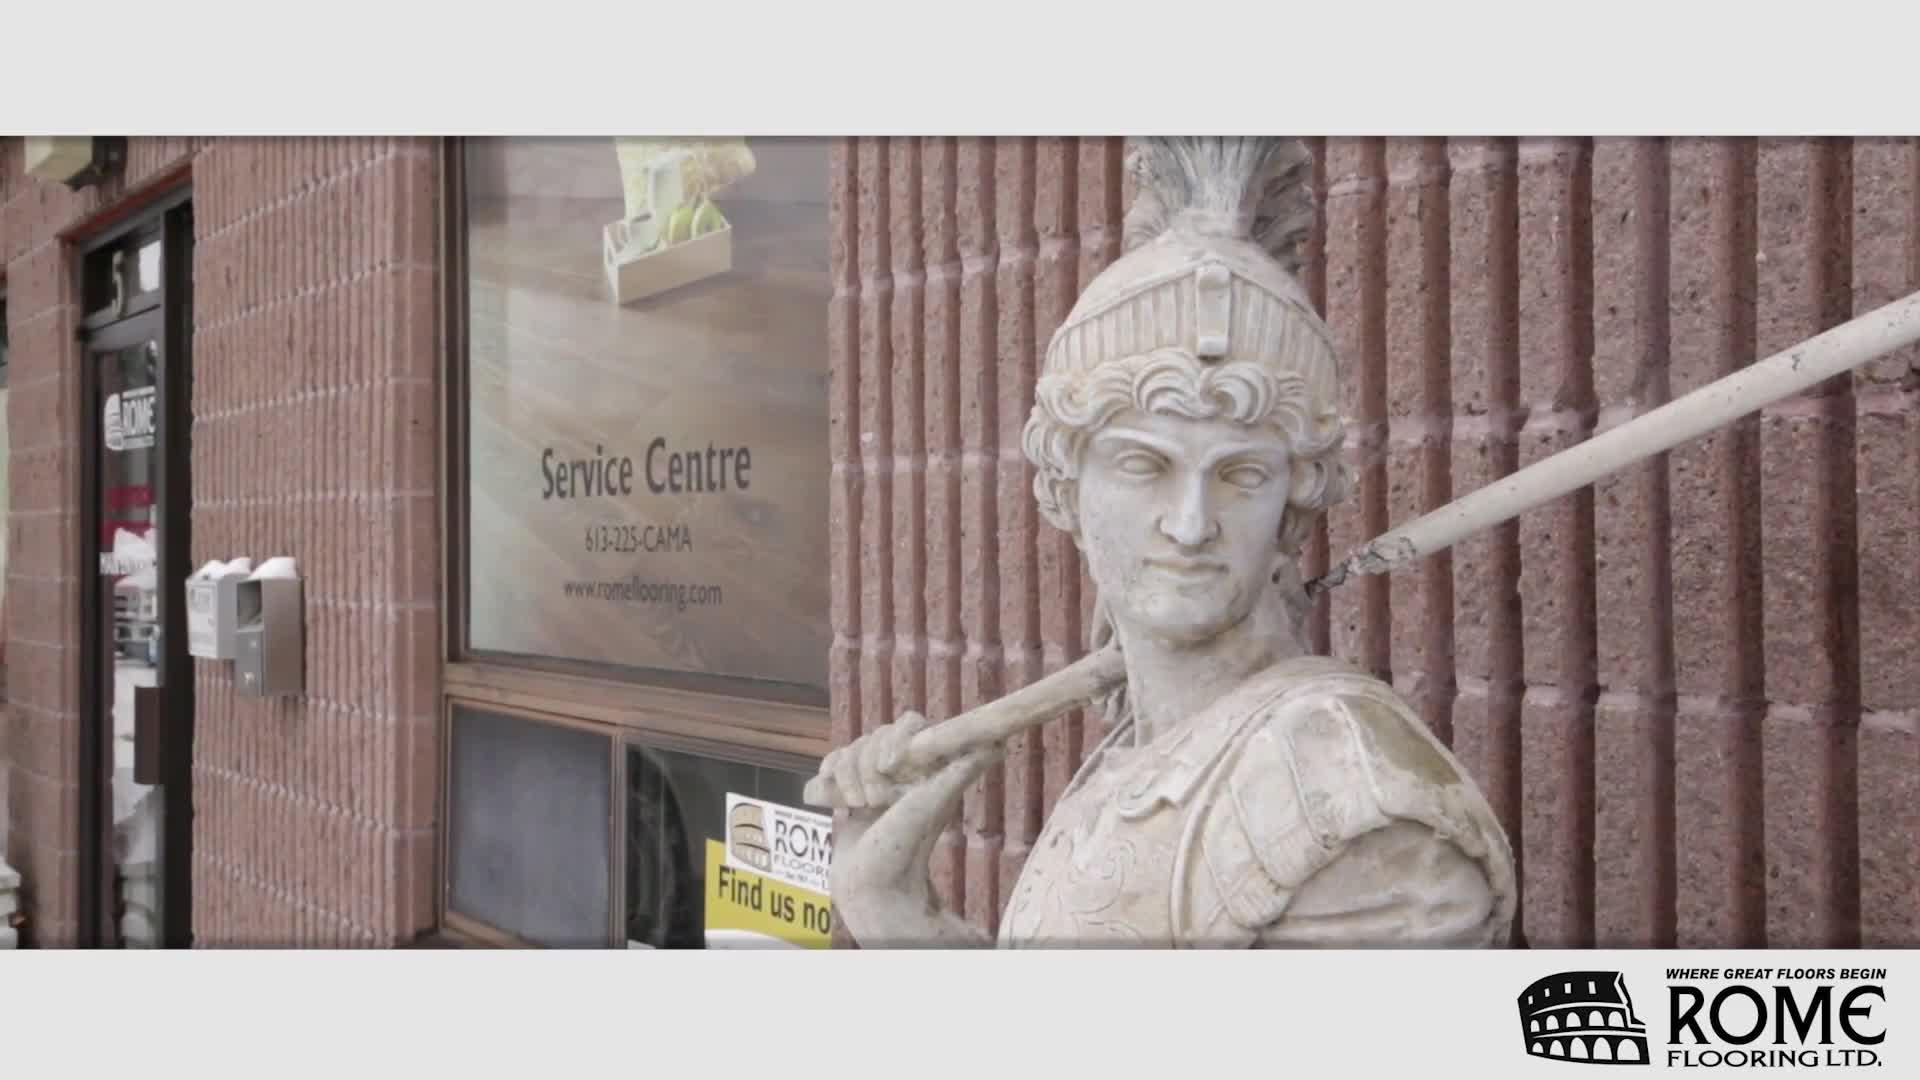 View Rome Flooring Ltd's Ottawa profile